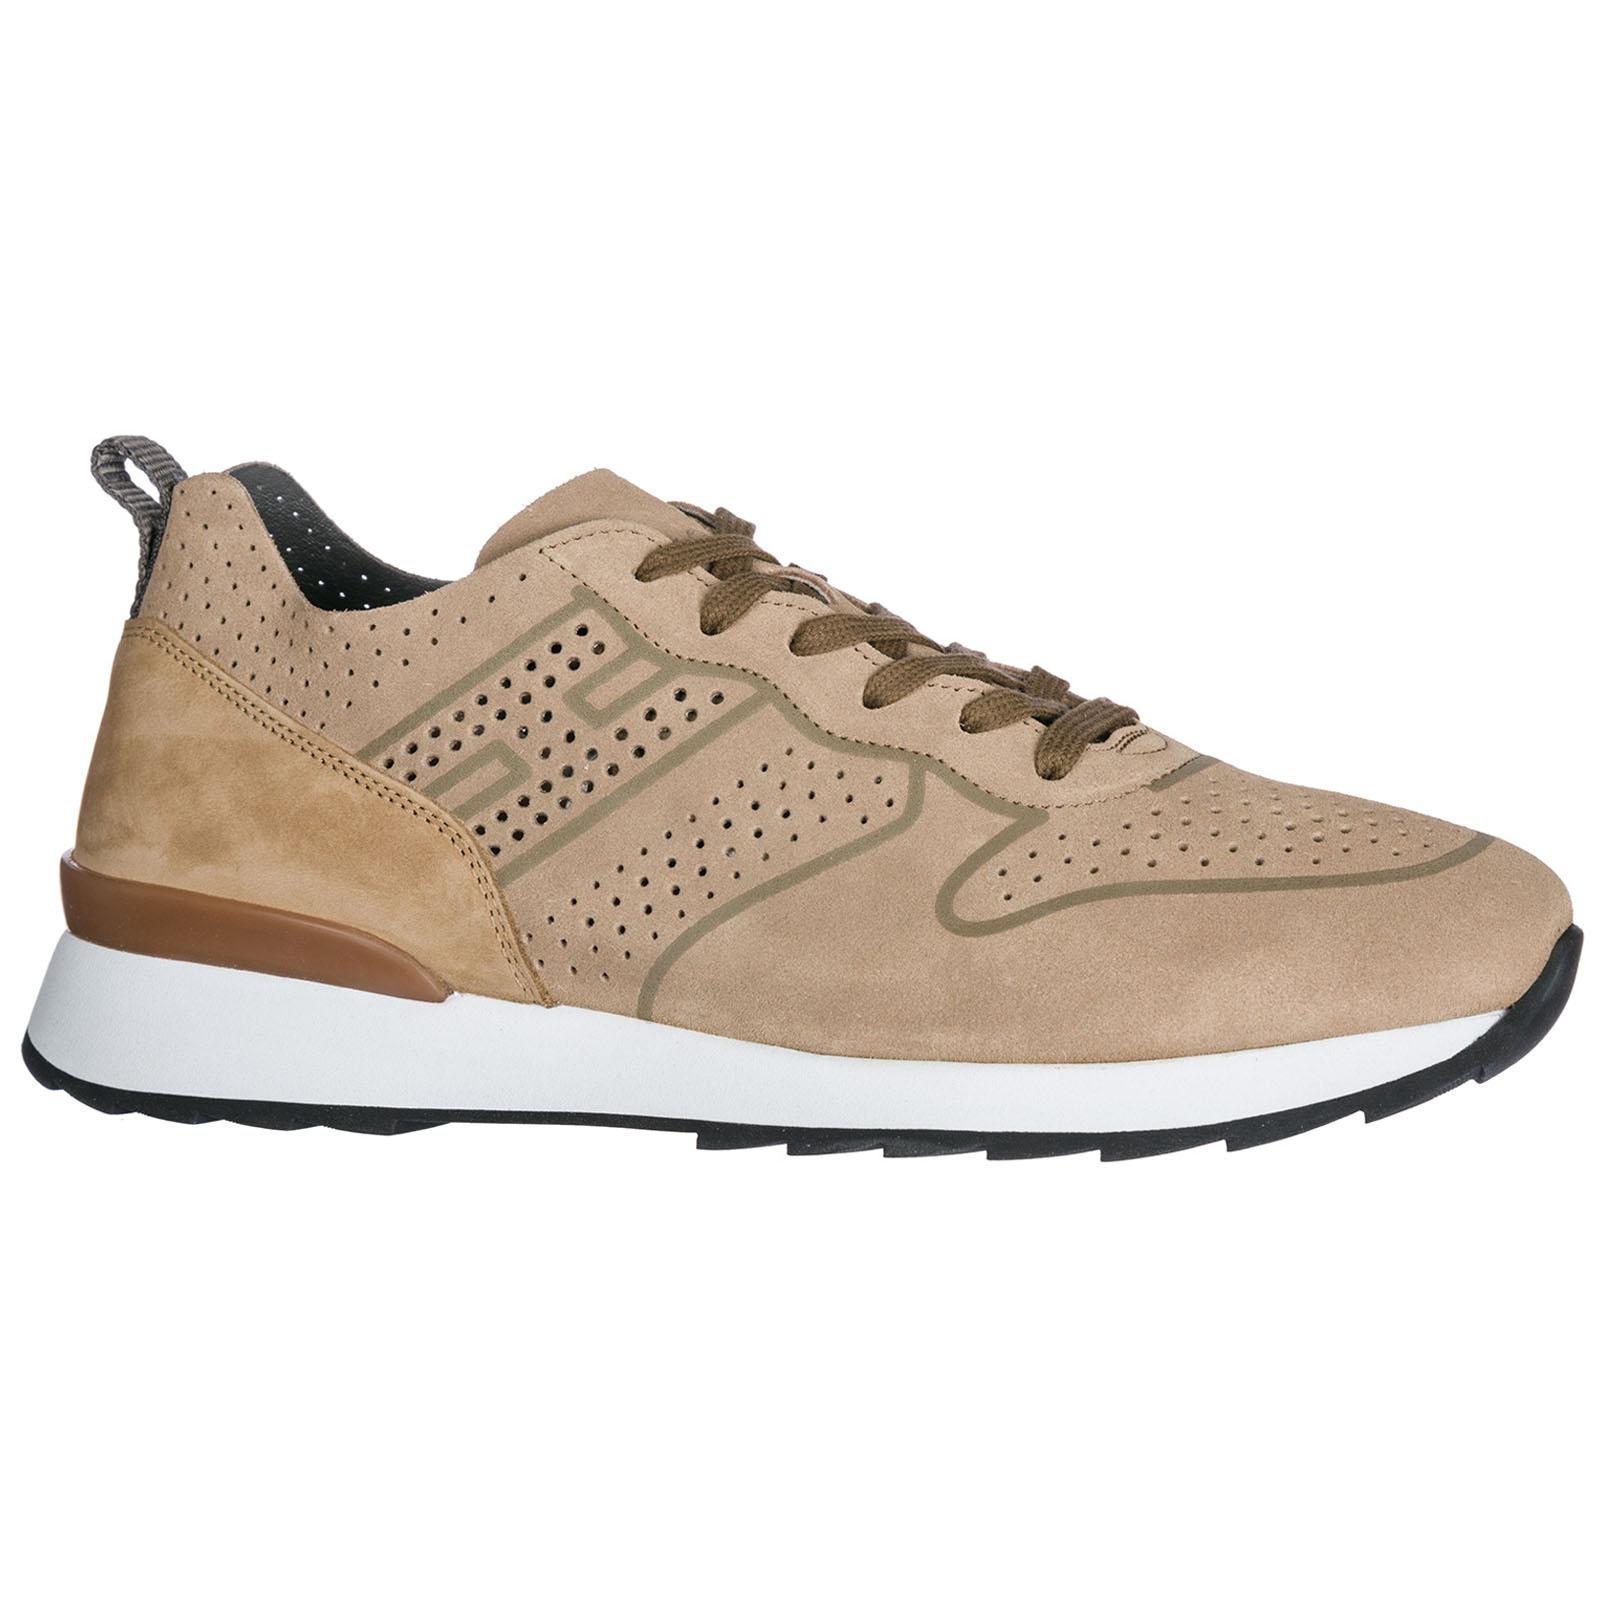 e5682d136234d Sneakers Hogan Running - R261 HXM2610K200IHHC808 biscotto medio ...